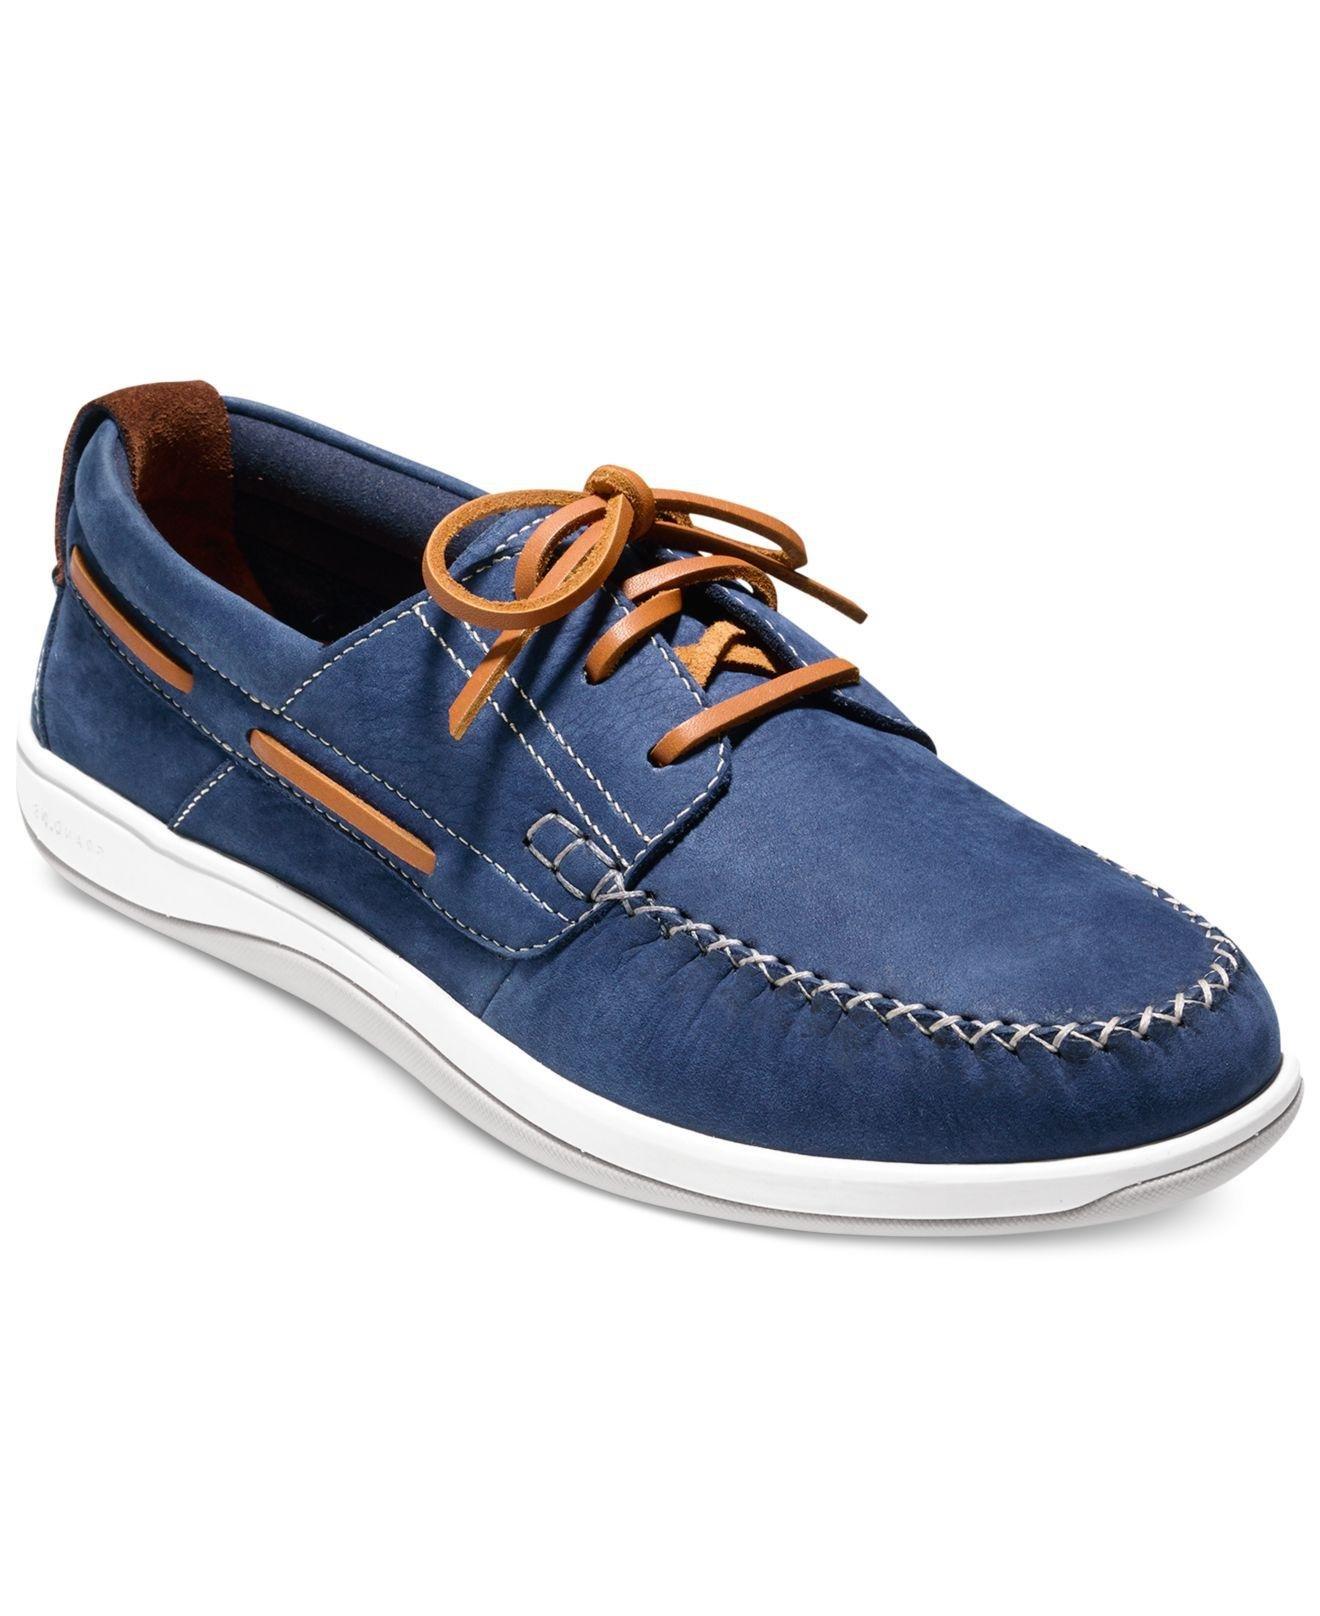 Macys Mens Boat Shoes